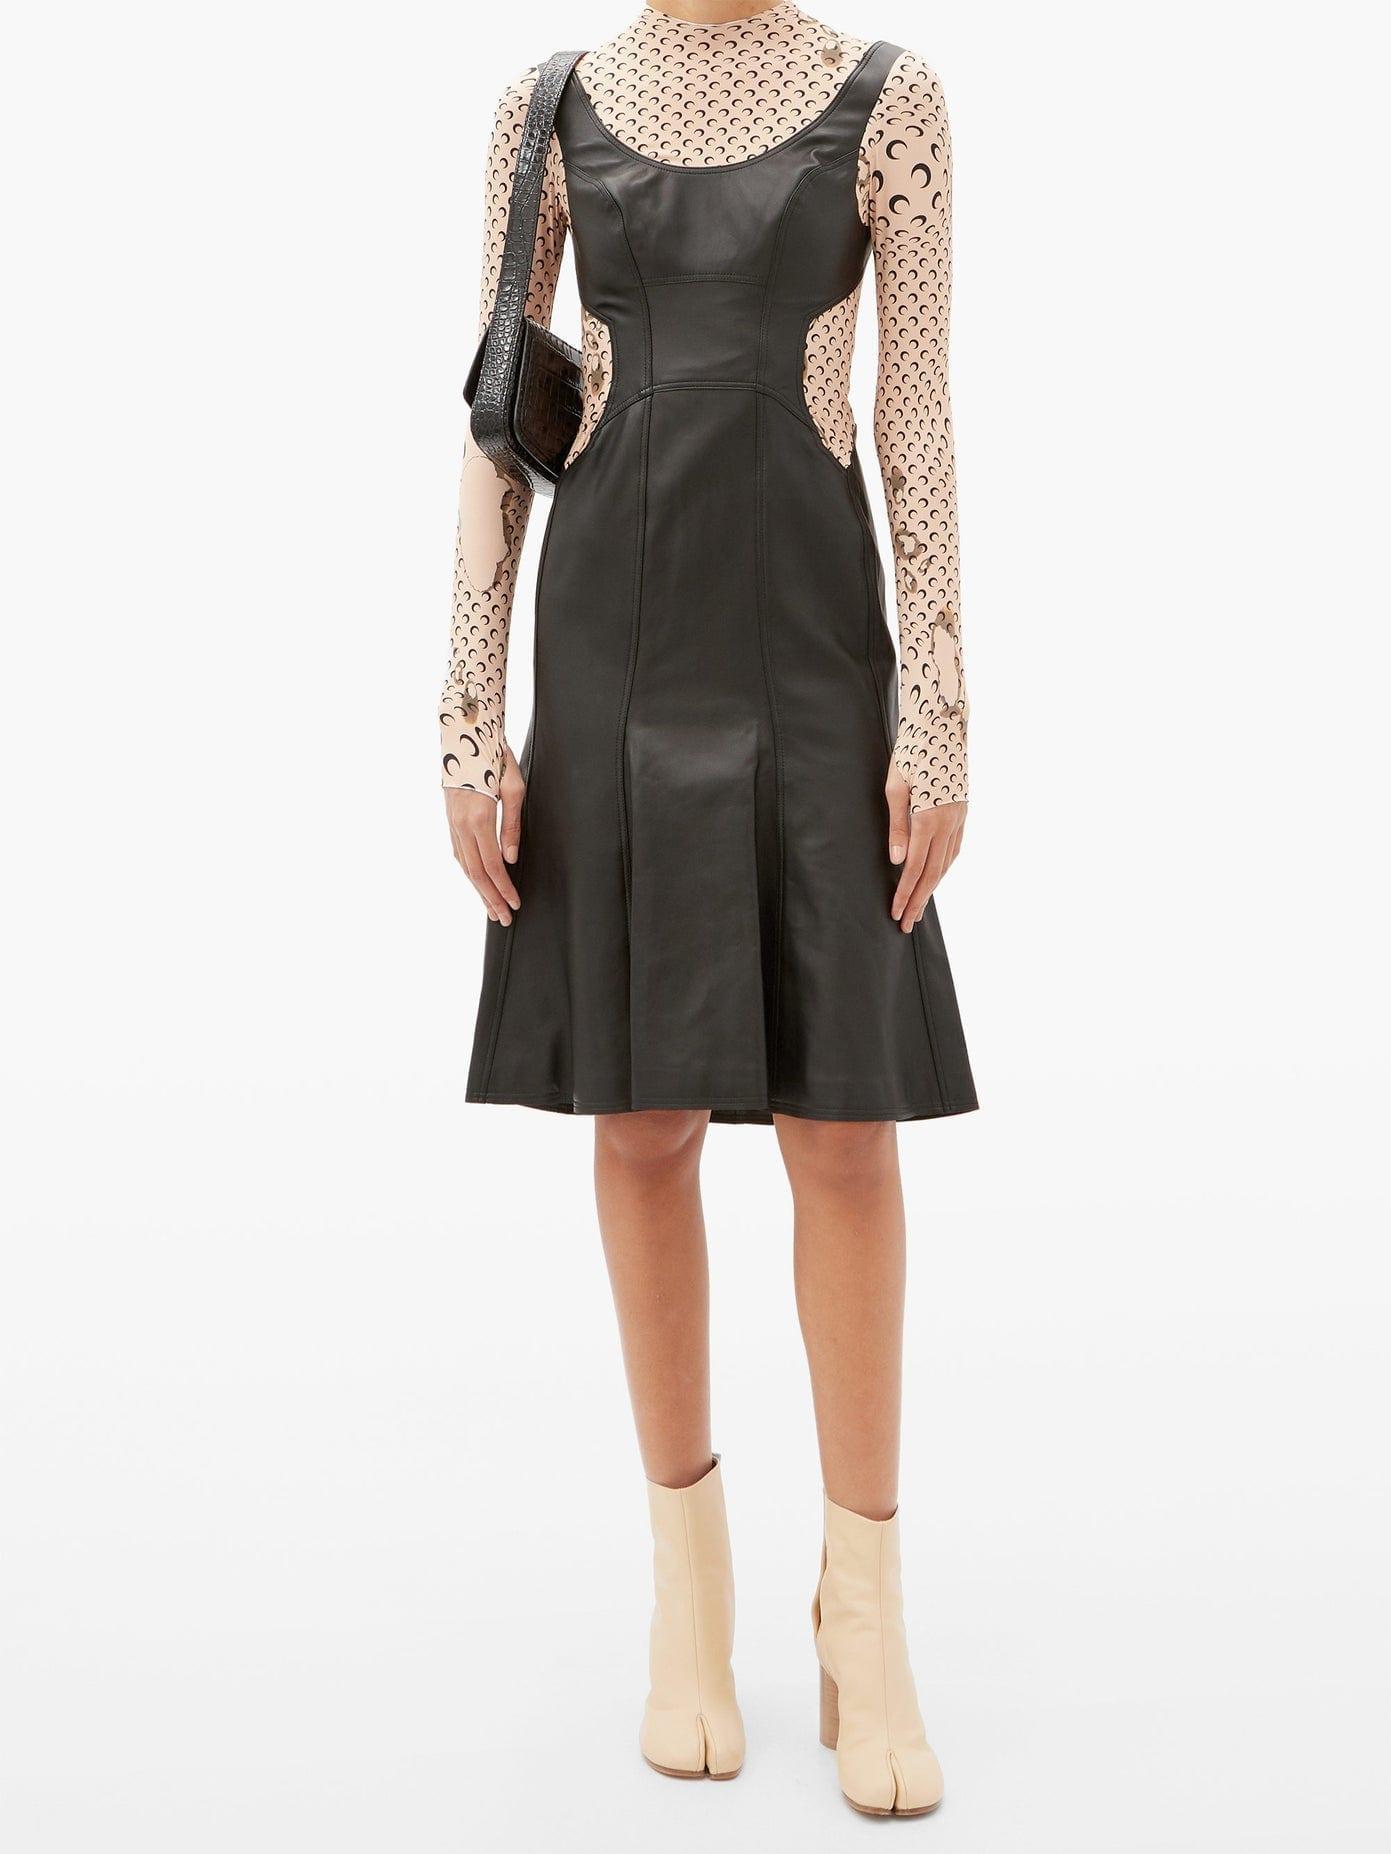 MARINE SERRE Moon-print Upcycled-leather Dress